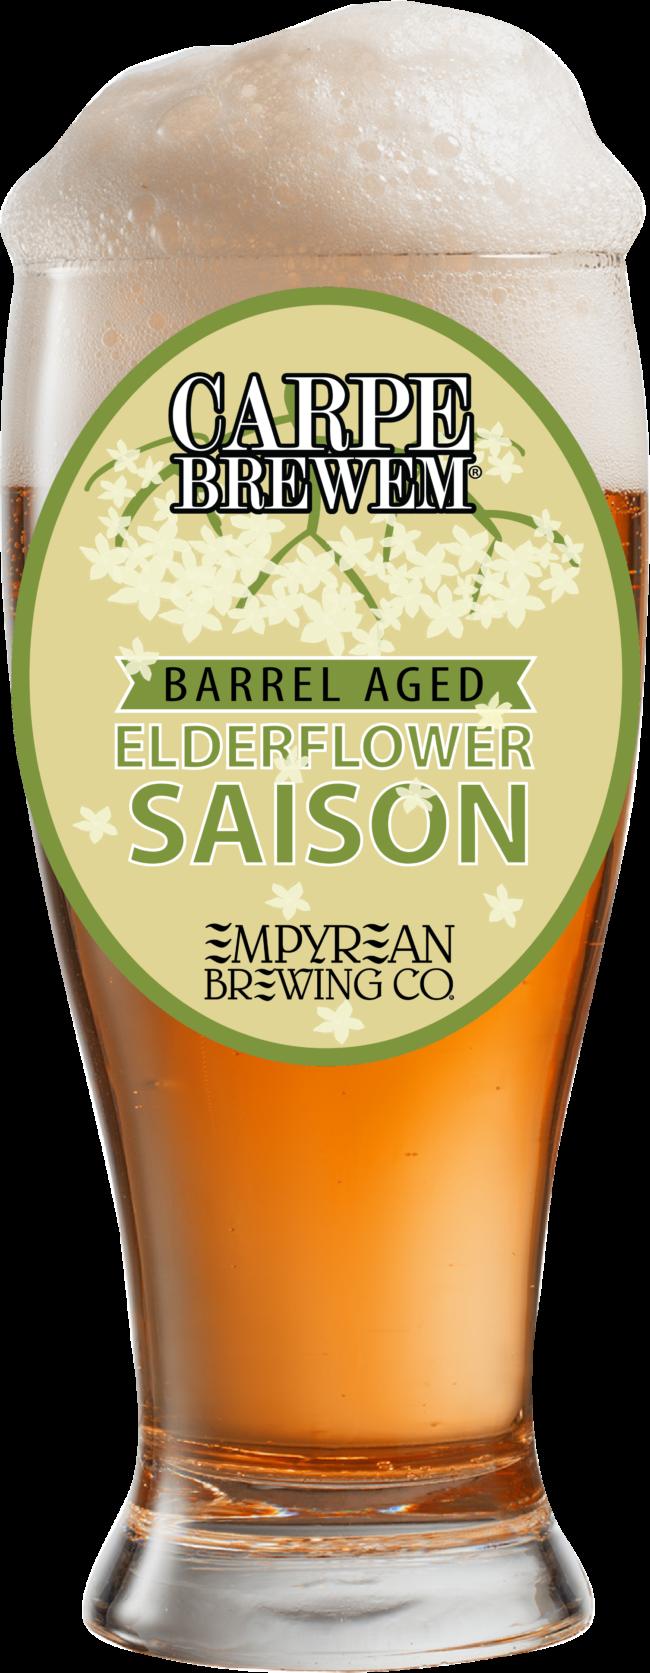 Barrel Aged Elderflower Saison